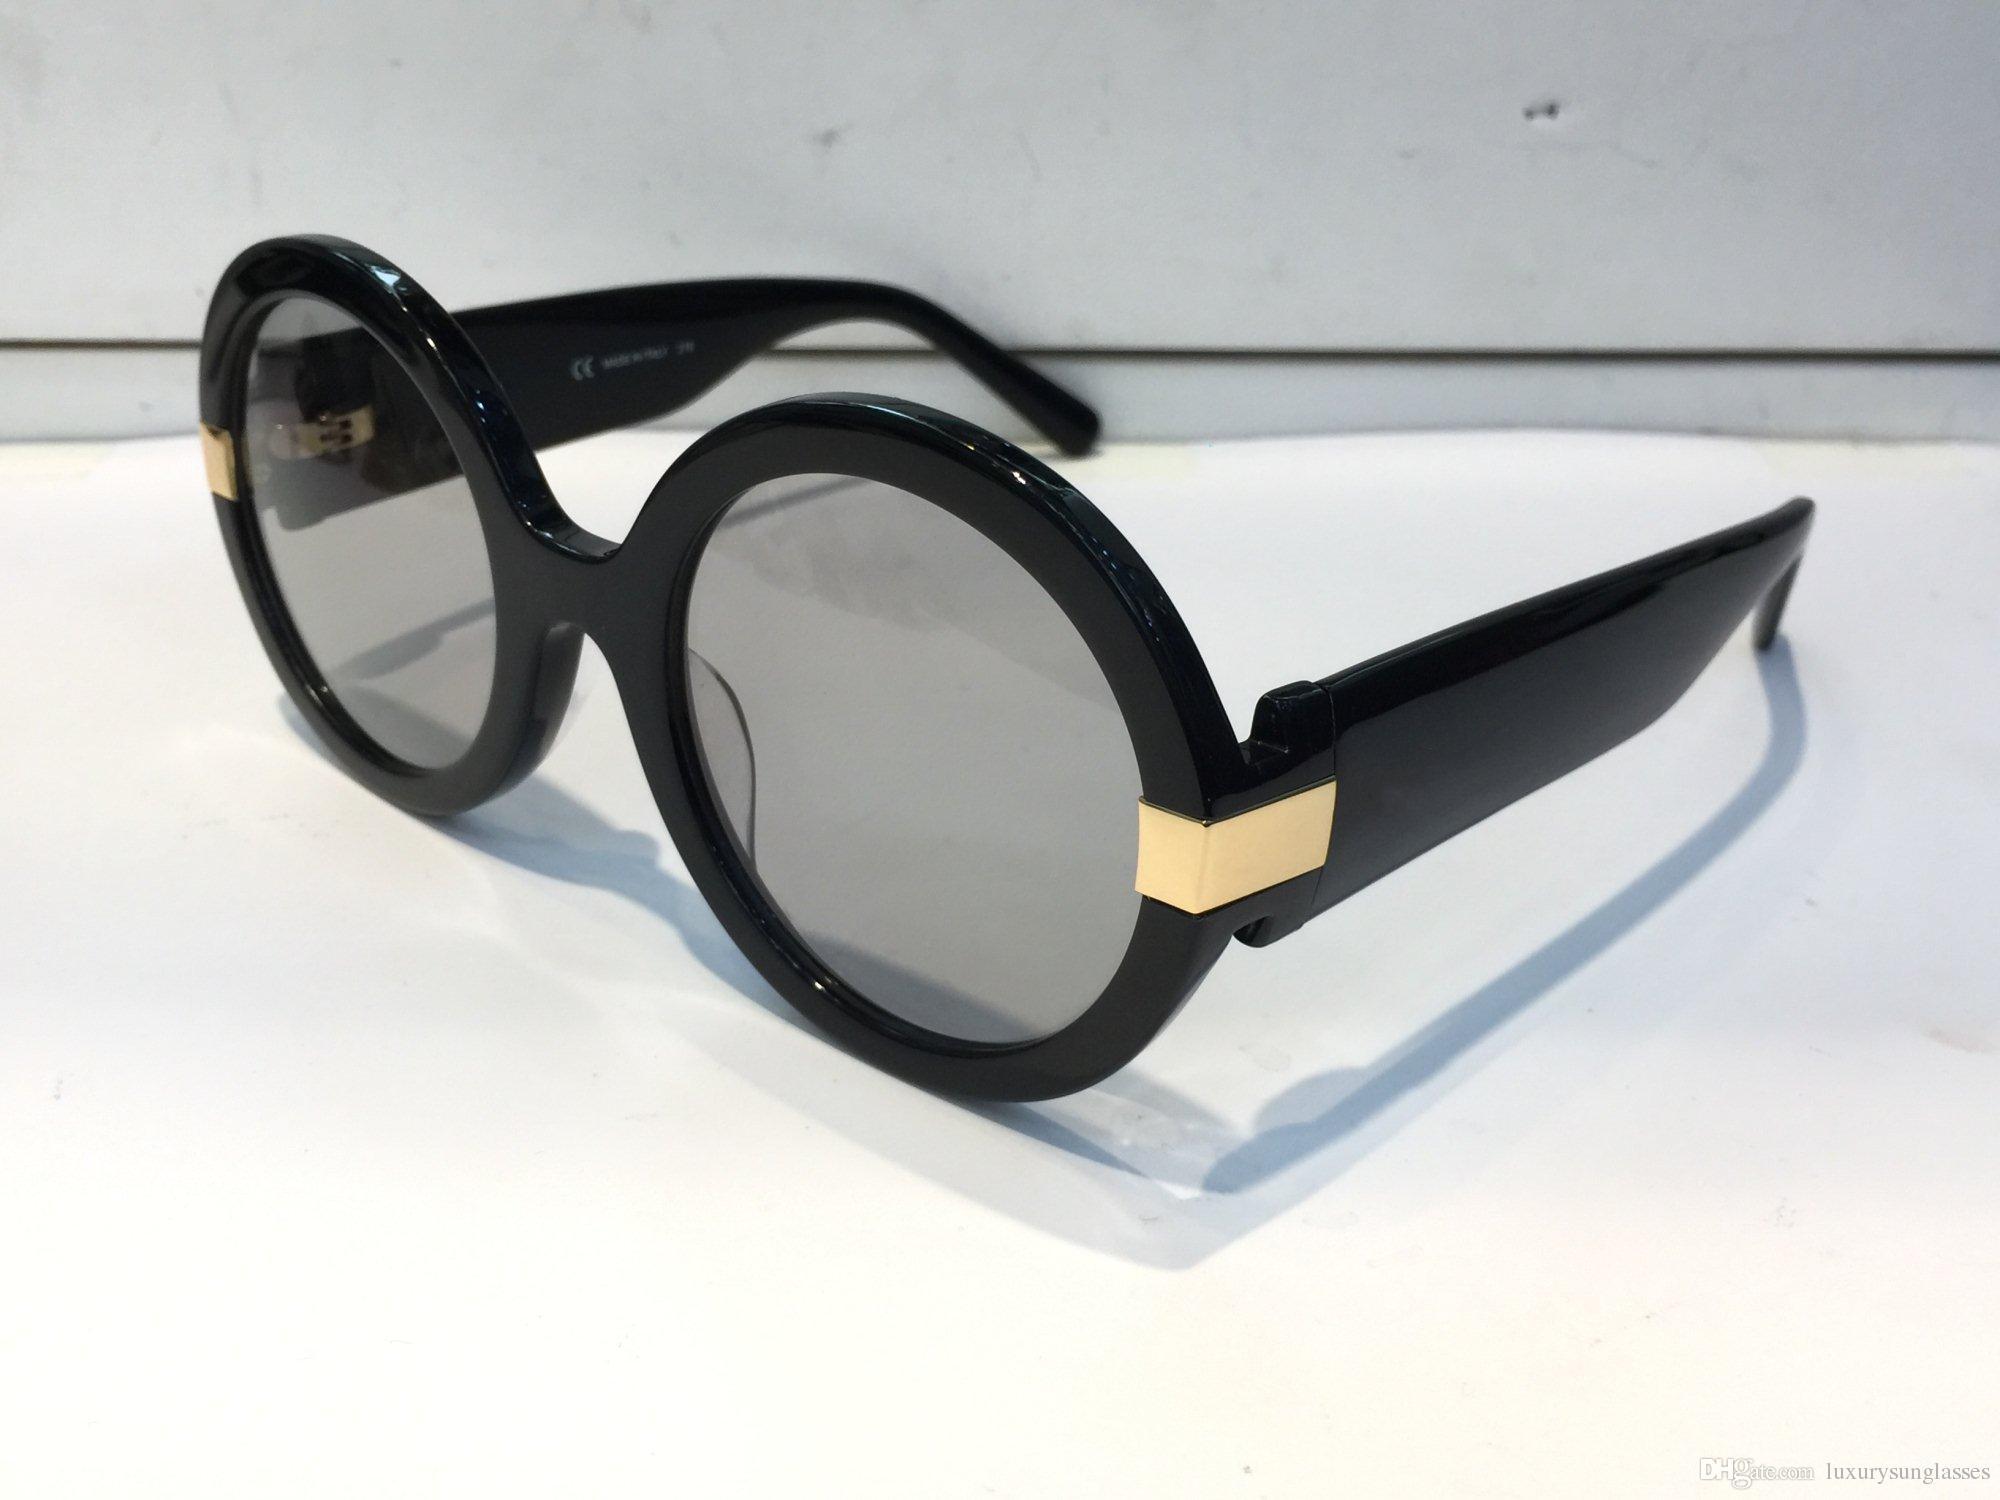 259bb55da9e Luxury 778 Sunglasses For Women Designer Fashion Sunglasses UV Protection  Coating Lens Classic Round Frame Top Quality Come With Package Vuarnet  Sunglasses ...